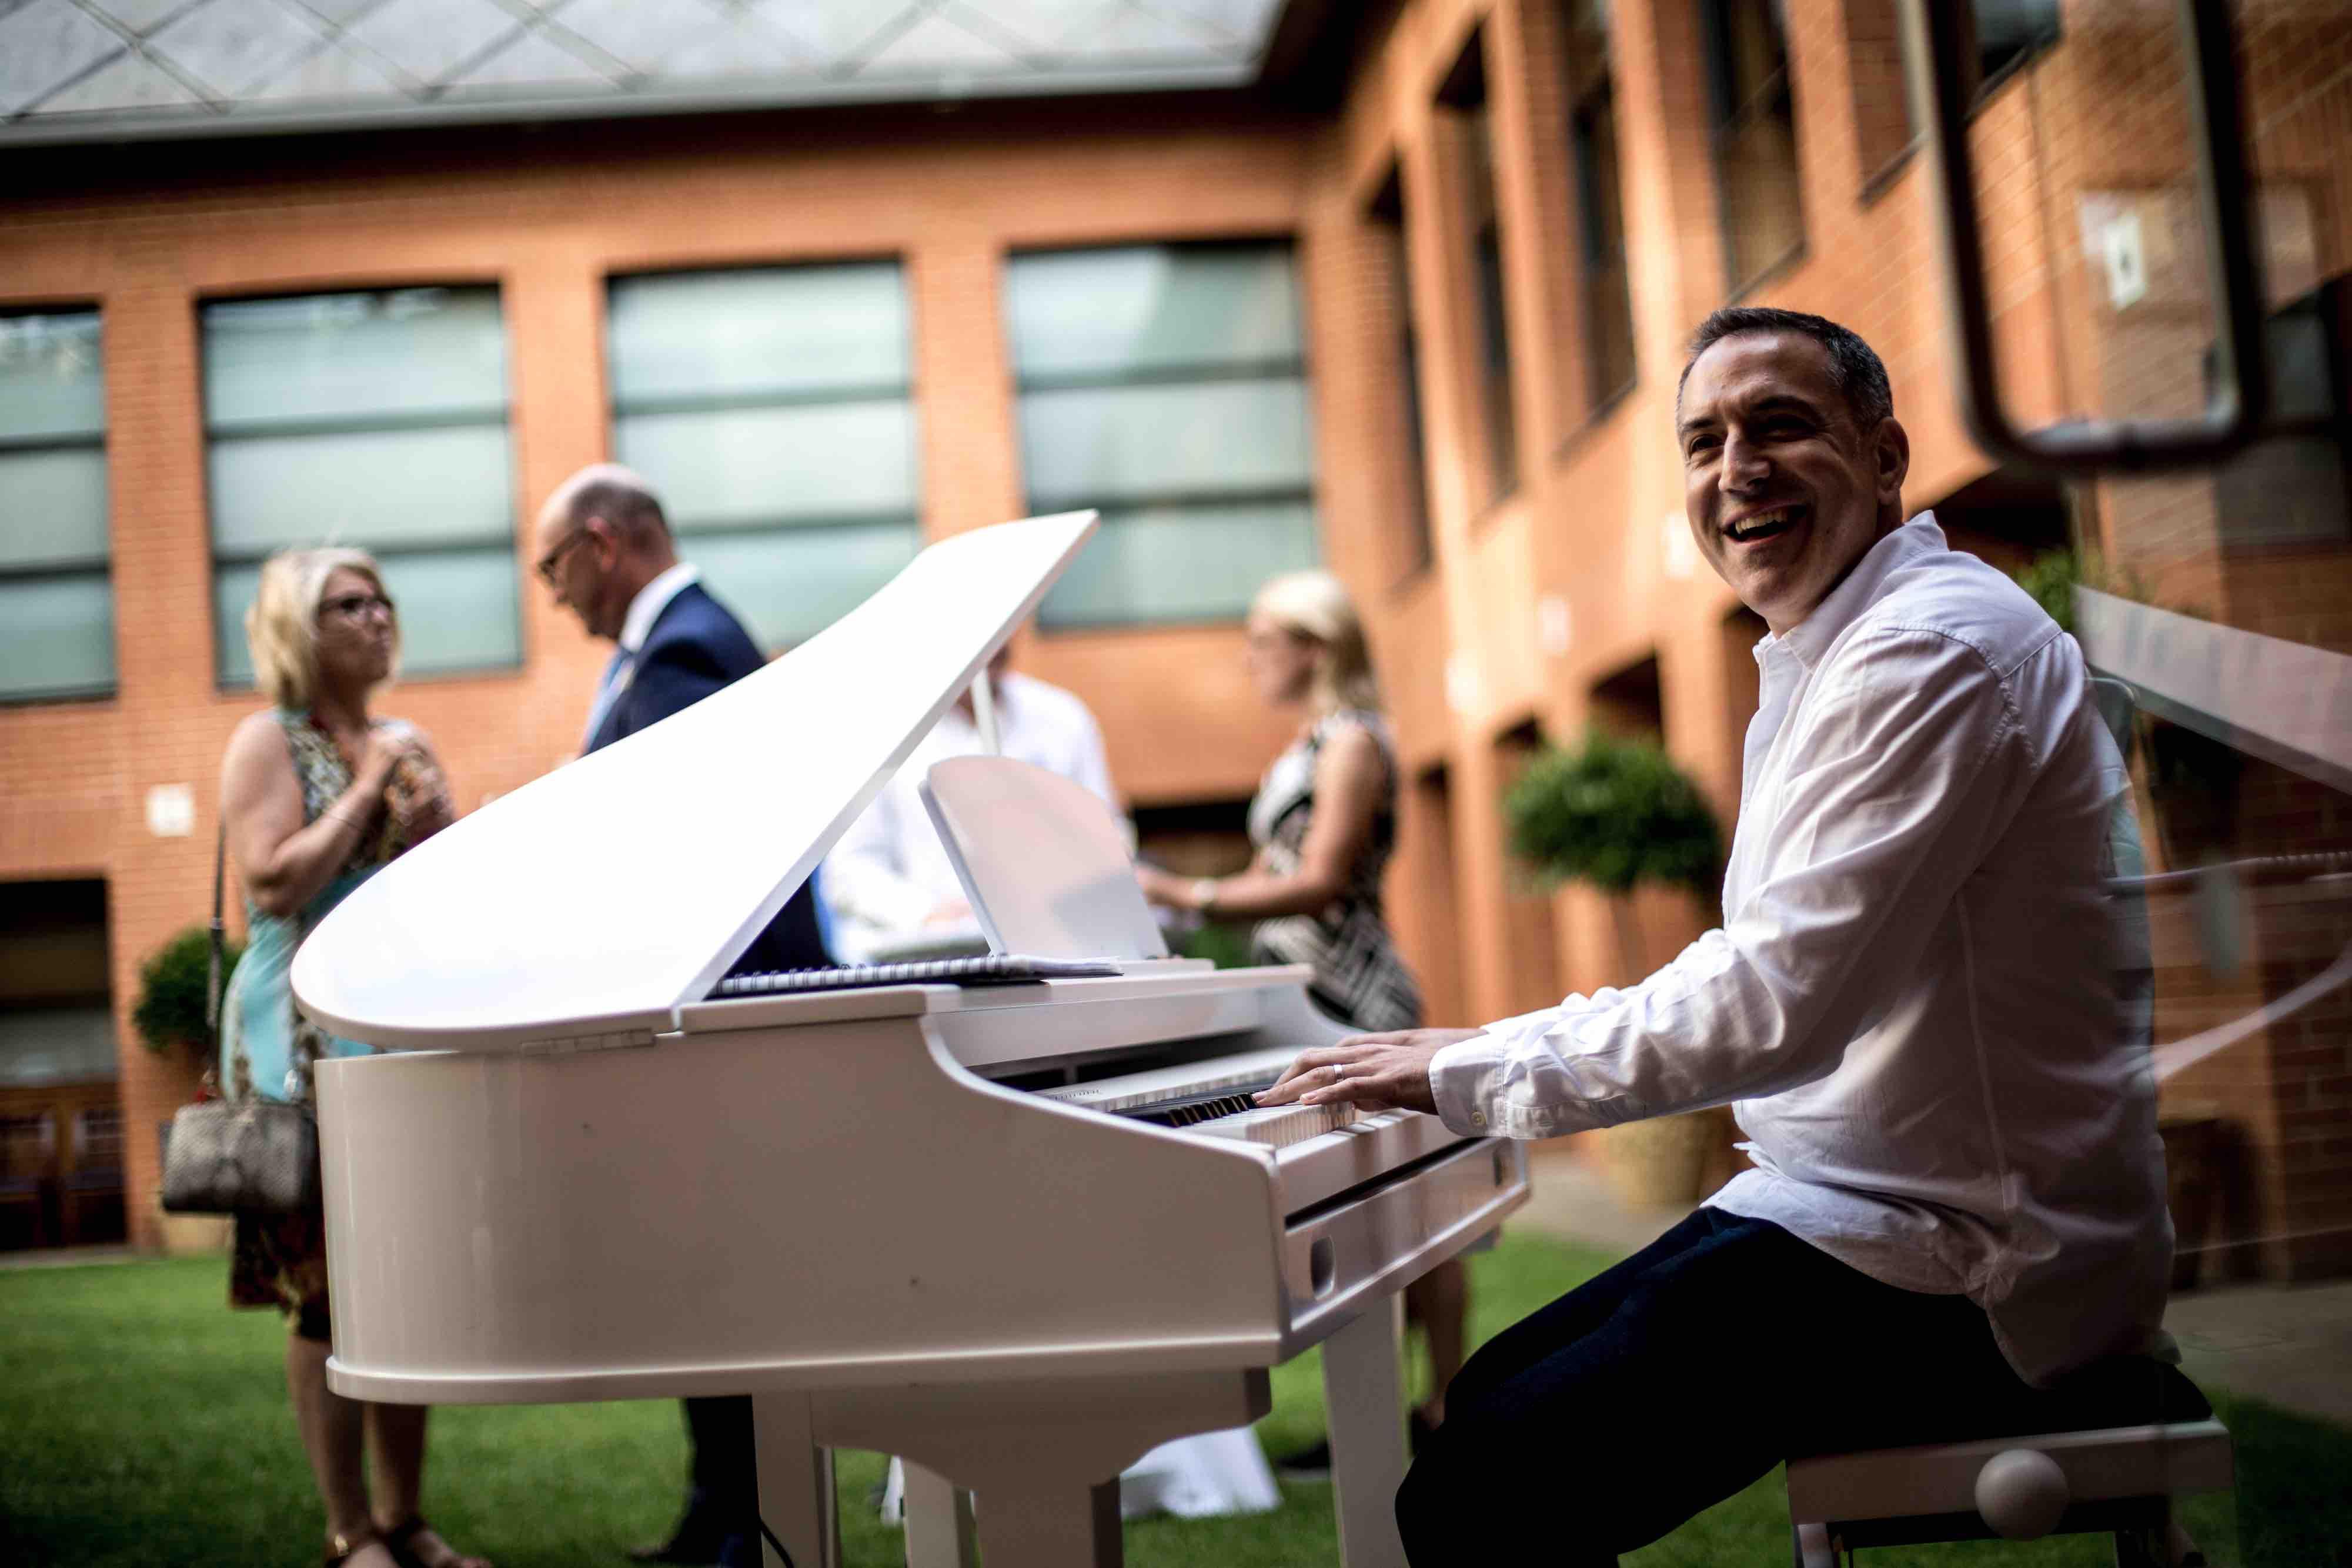 Bryan-Edery-Pianist-Surrey-Corporate-Event.jpg